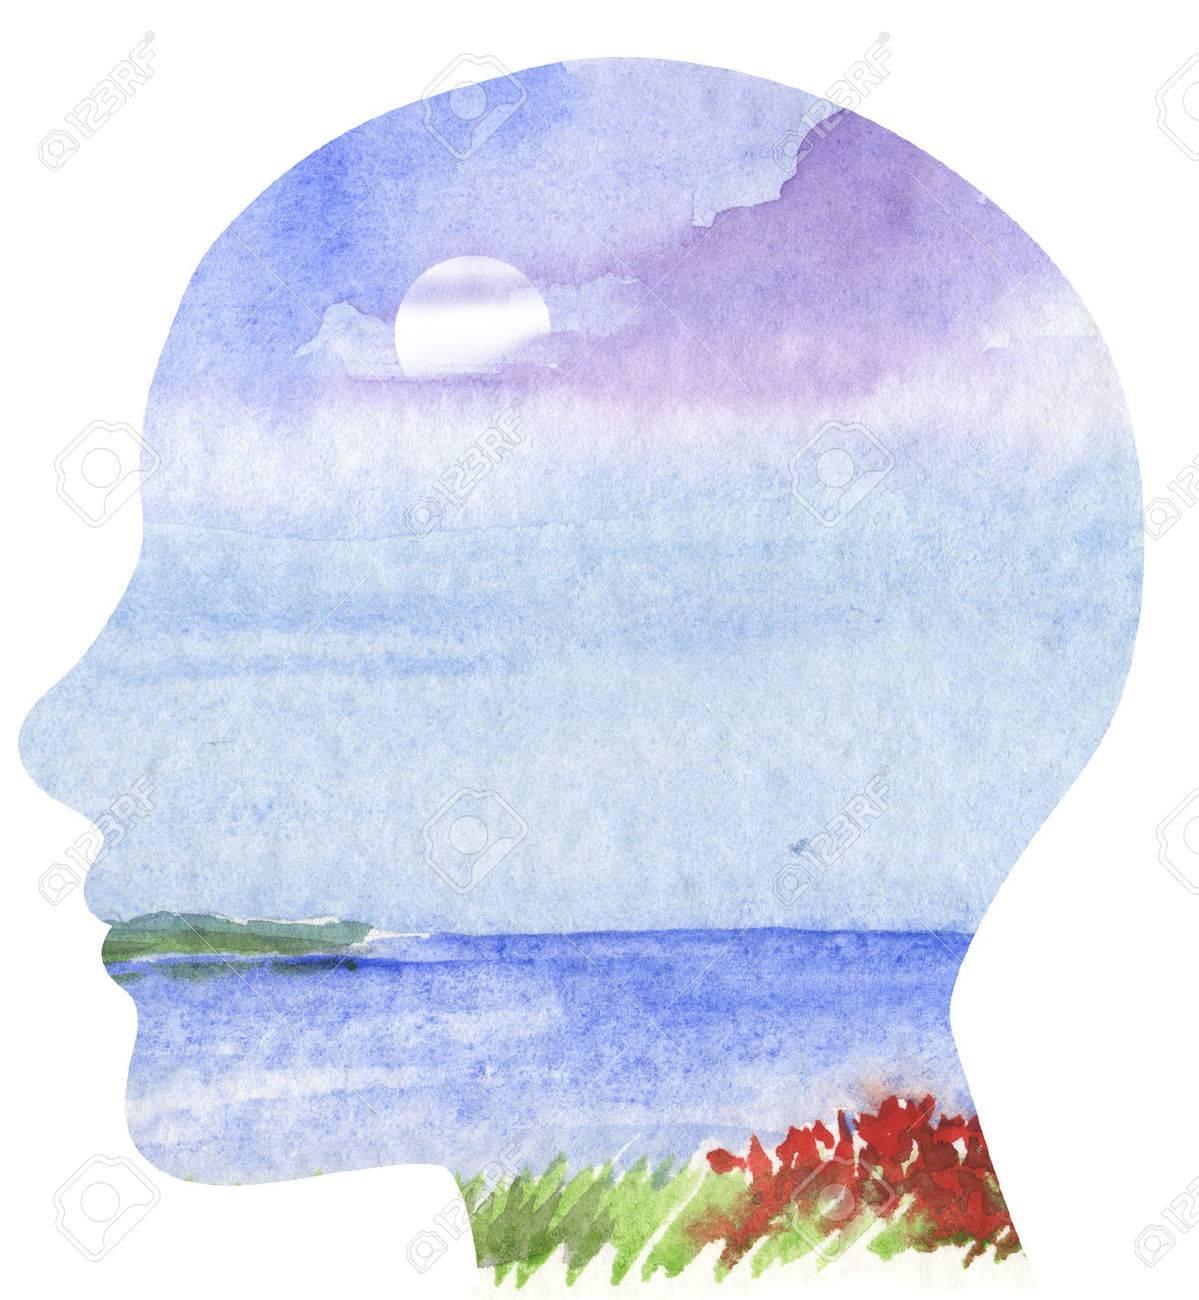 Human profile with sea landscape Stock Photo - 34309695